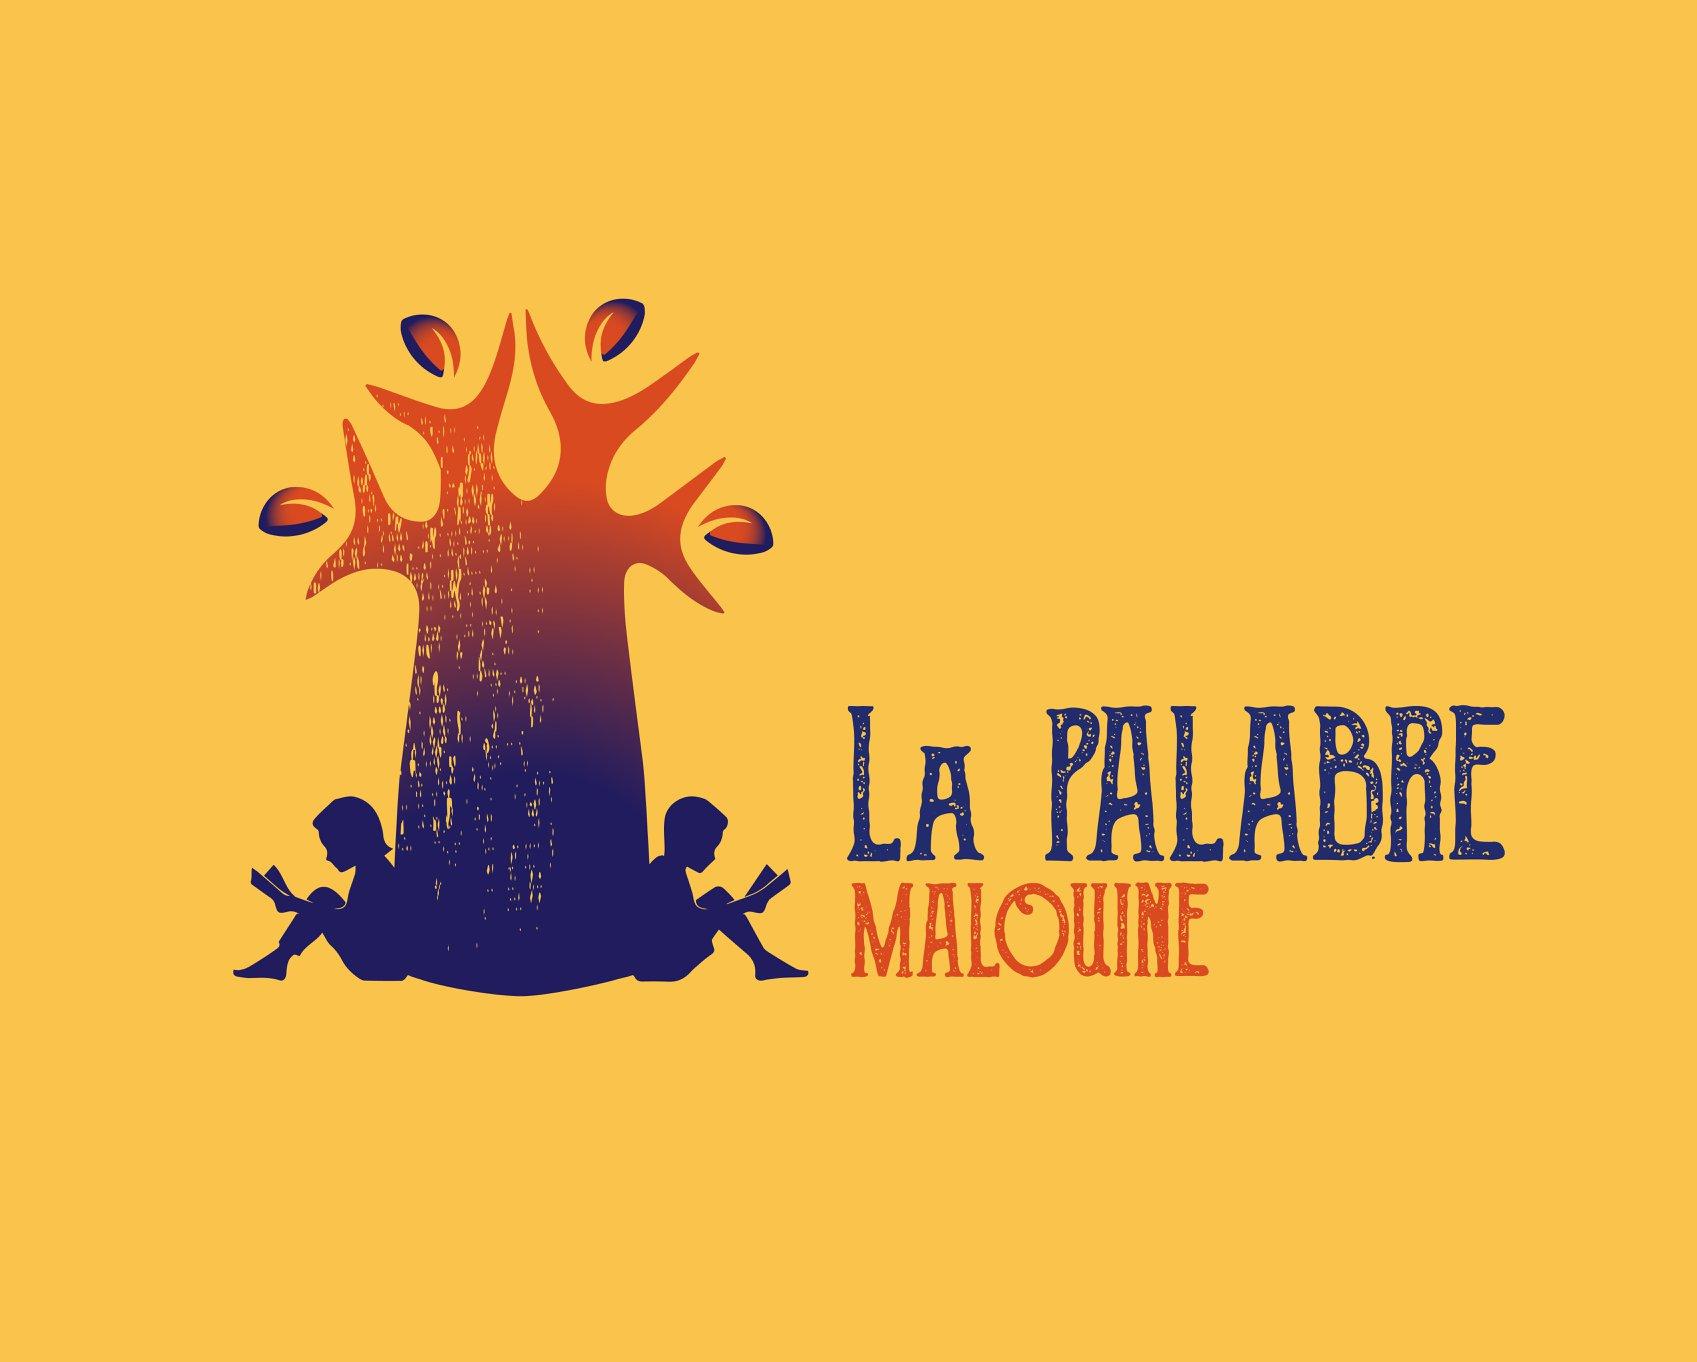 LA PALABRE MALOUINE